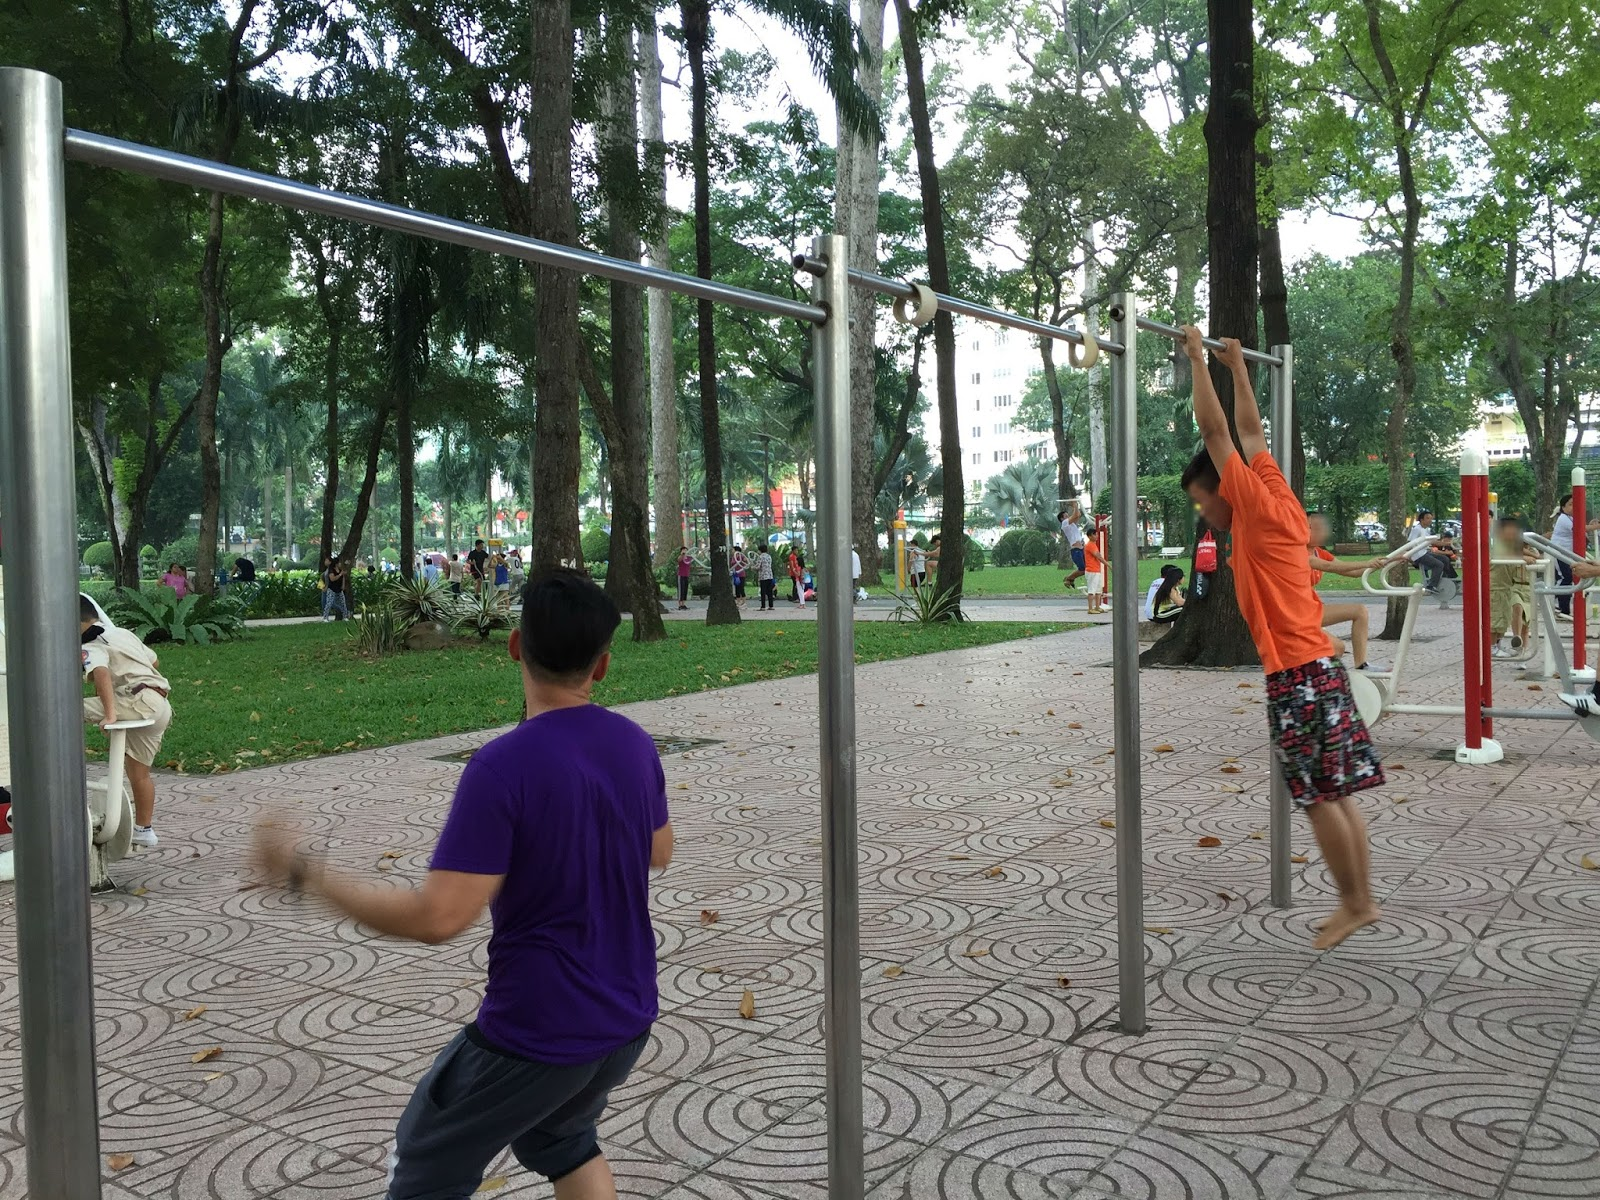 hcmc-vietnam-sport-park ベトナムの公園とアスレチック